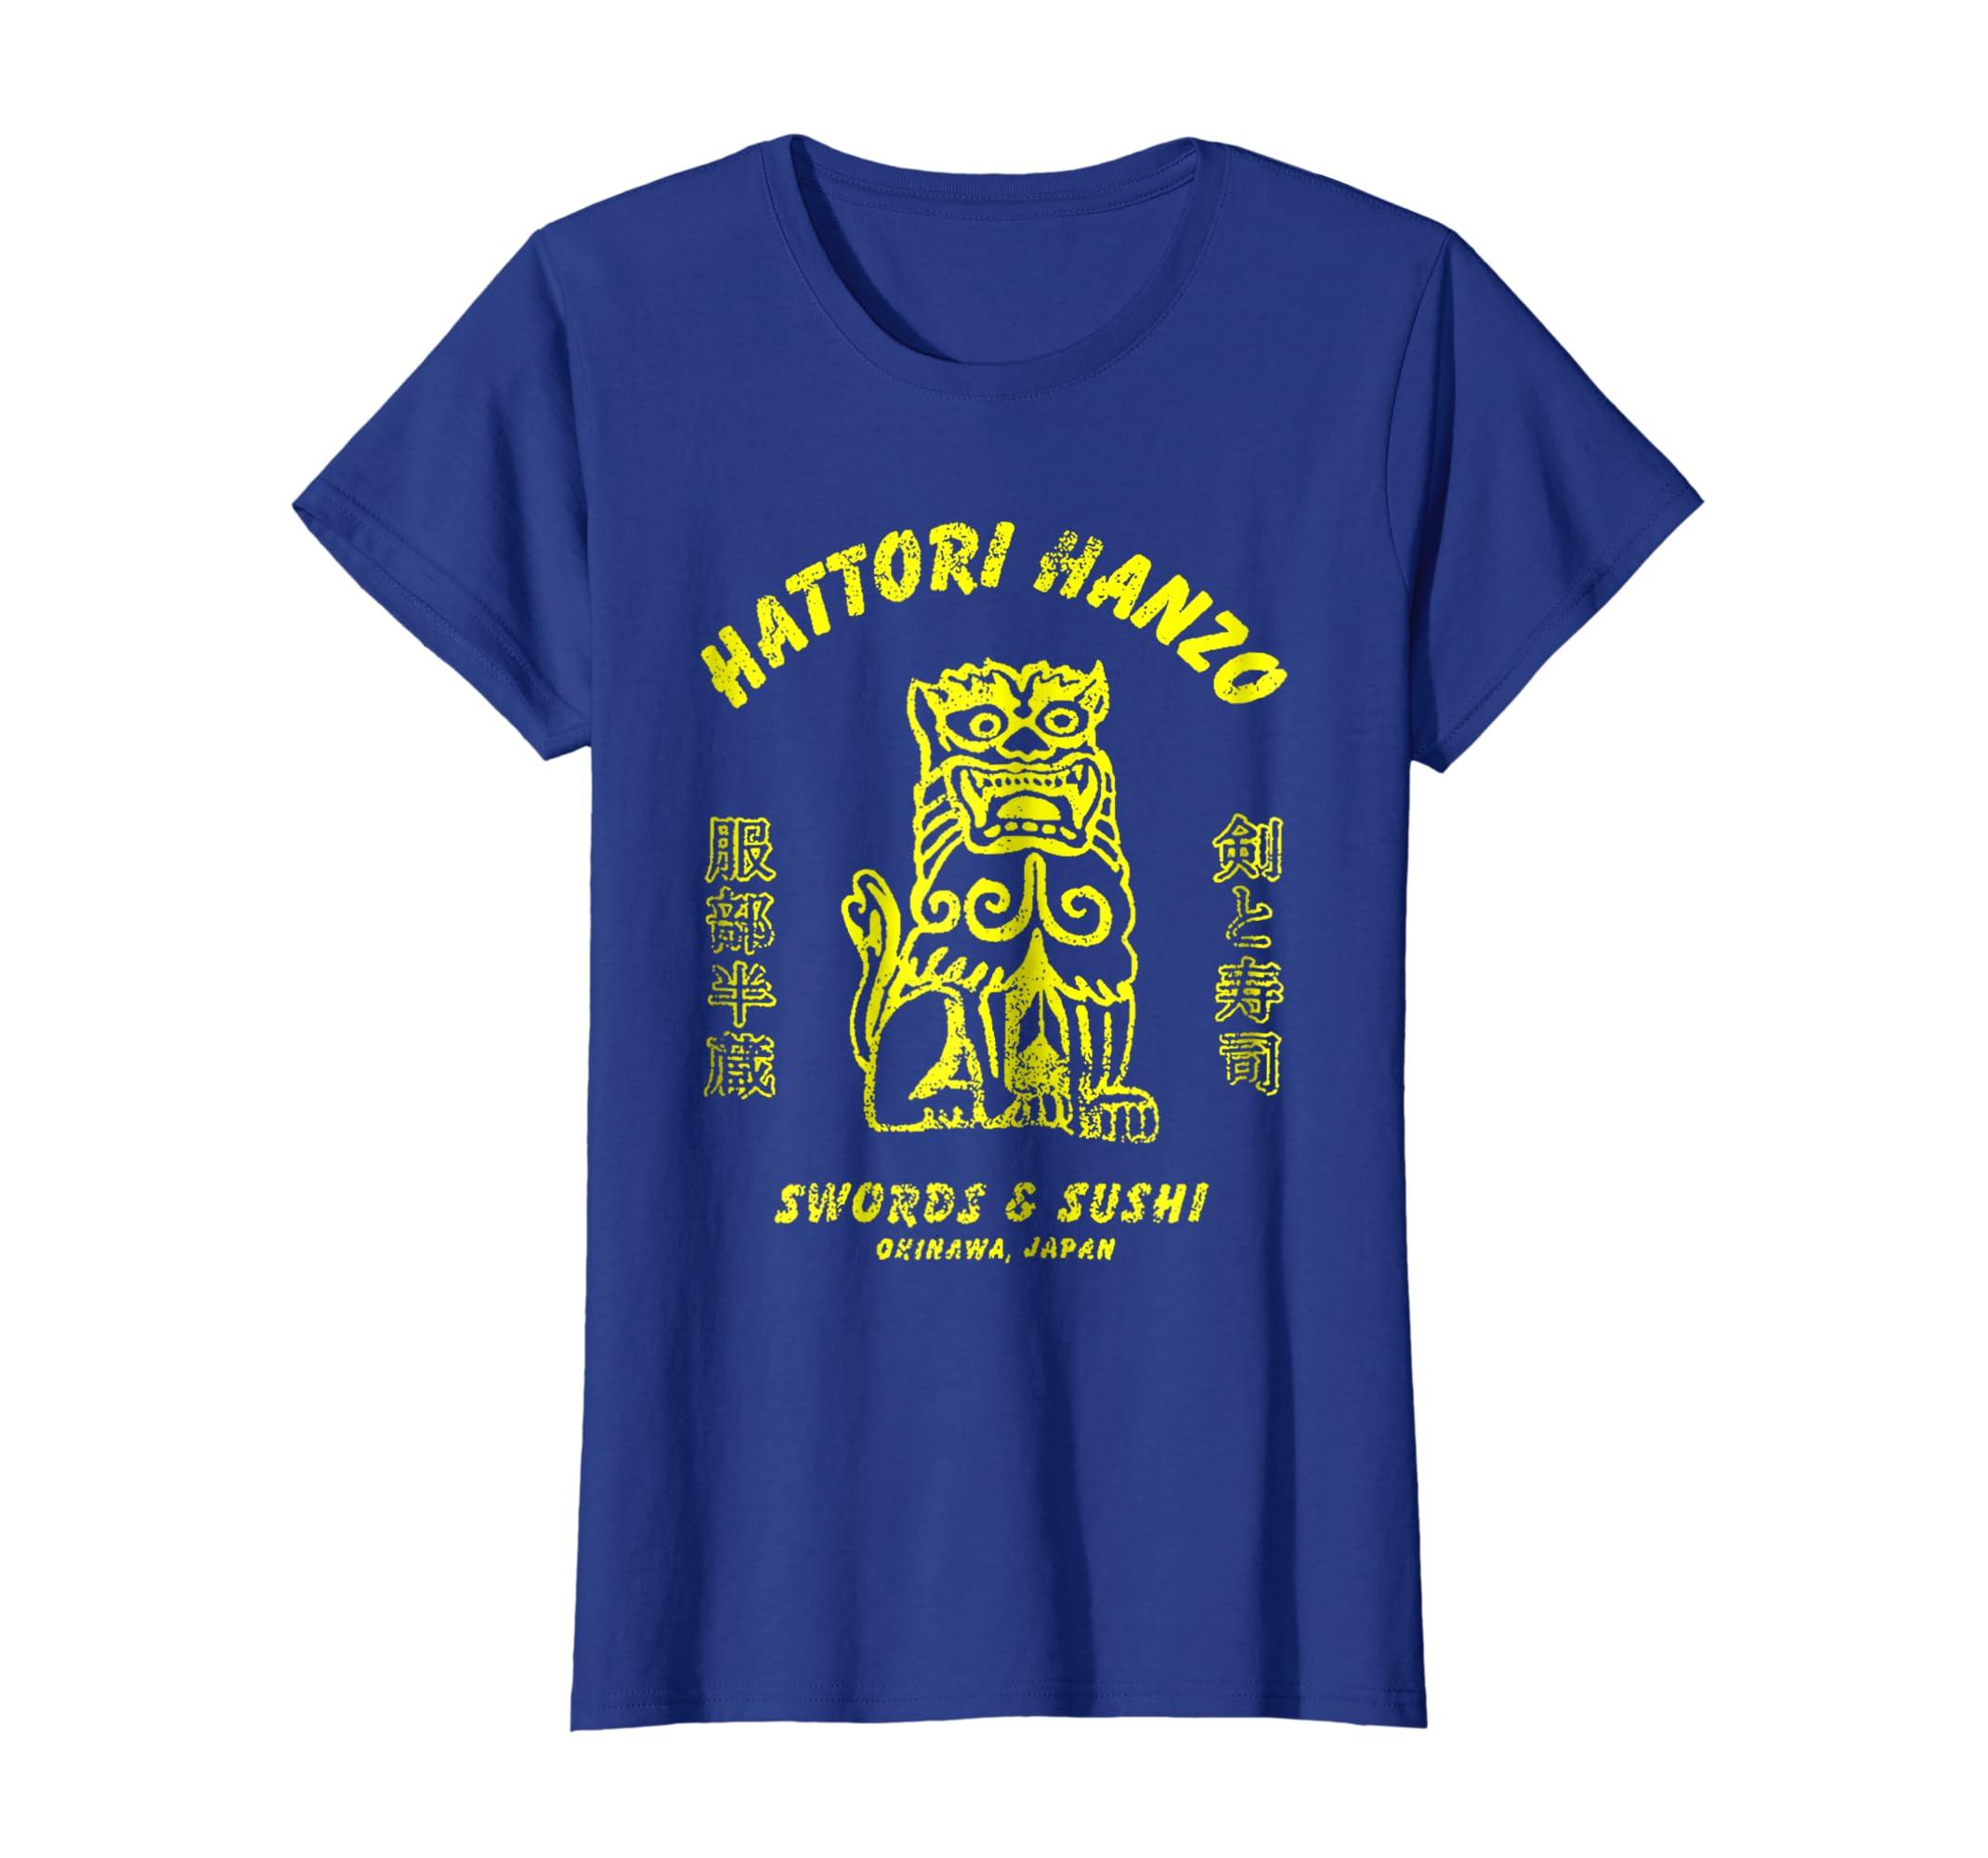 47ac1fc7b8d Amazon.com  Hattori Hanzo Swords and Sushi T-Shirt  Clothing